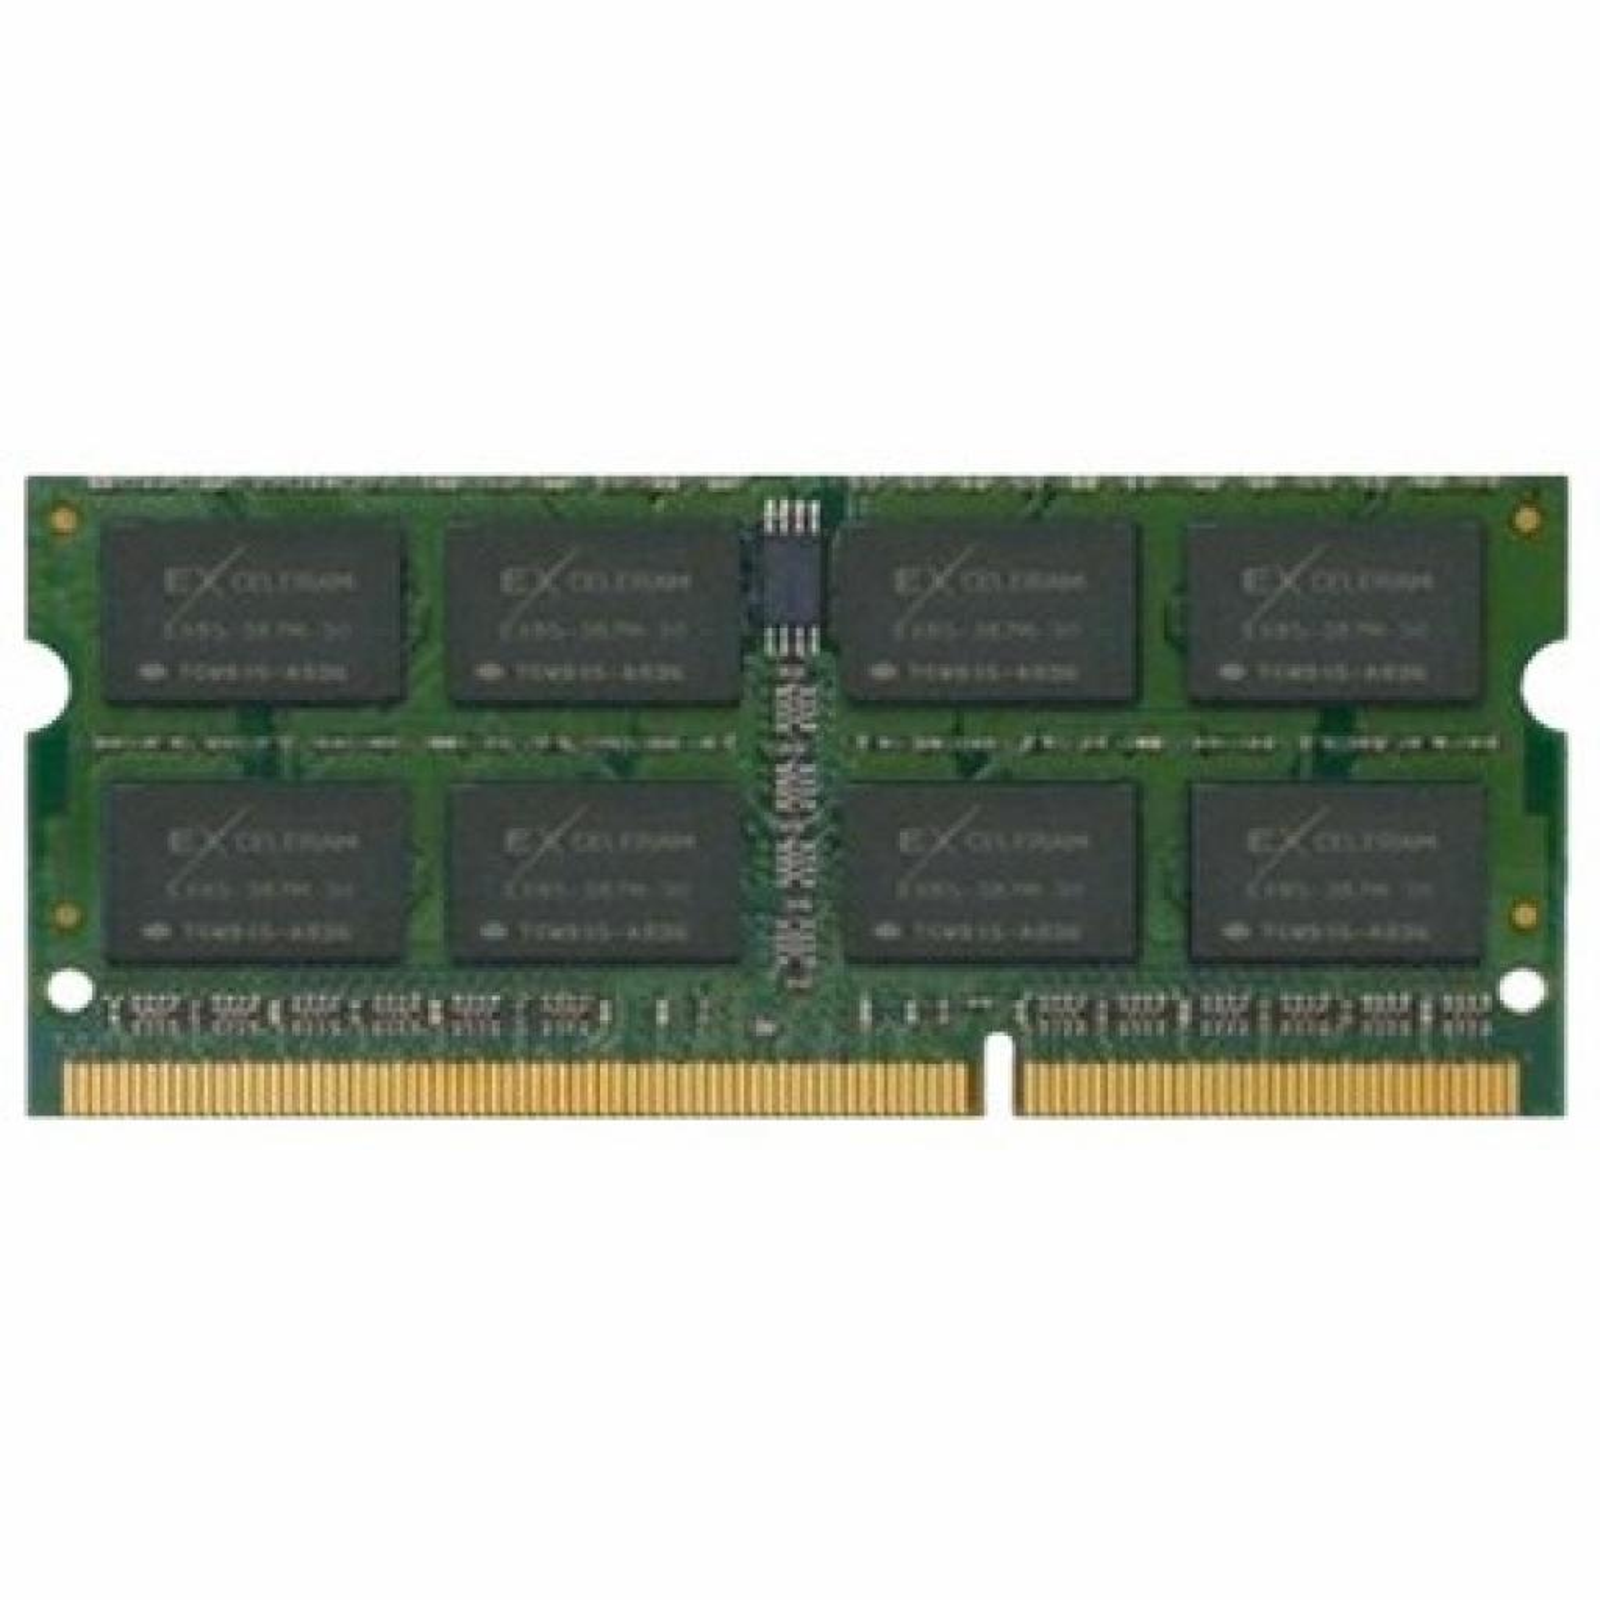 Модуль памяти для ноутбука SoDIMM DDR3 2GB 1333 MHz eXceleram (E30801S)